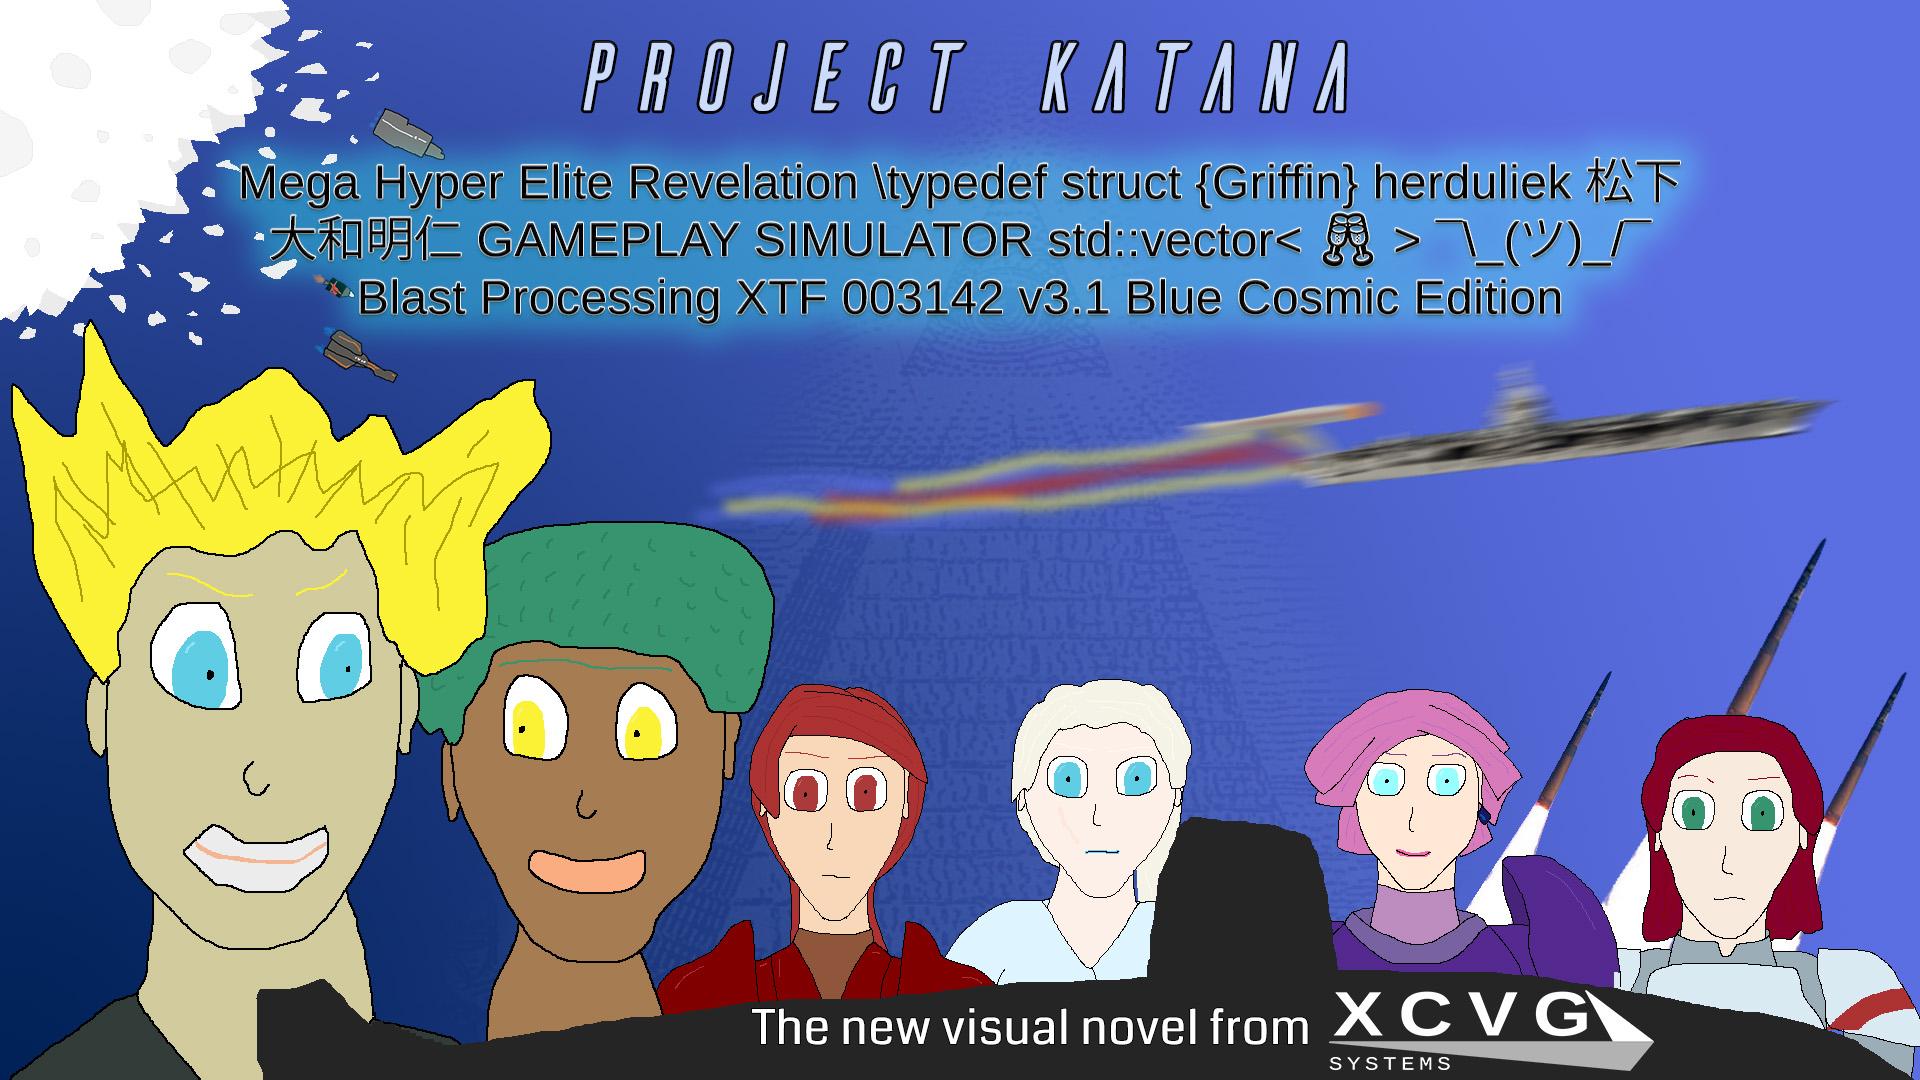 Project Katana